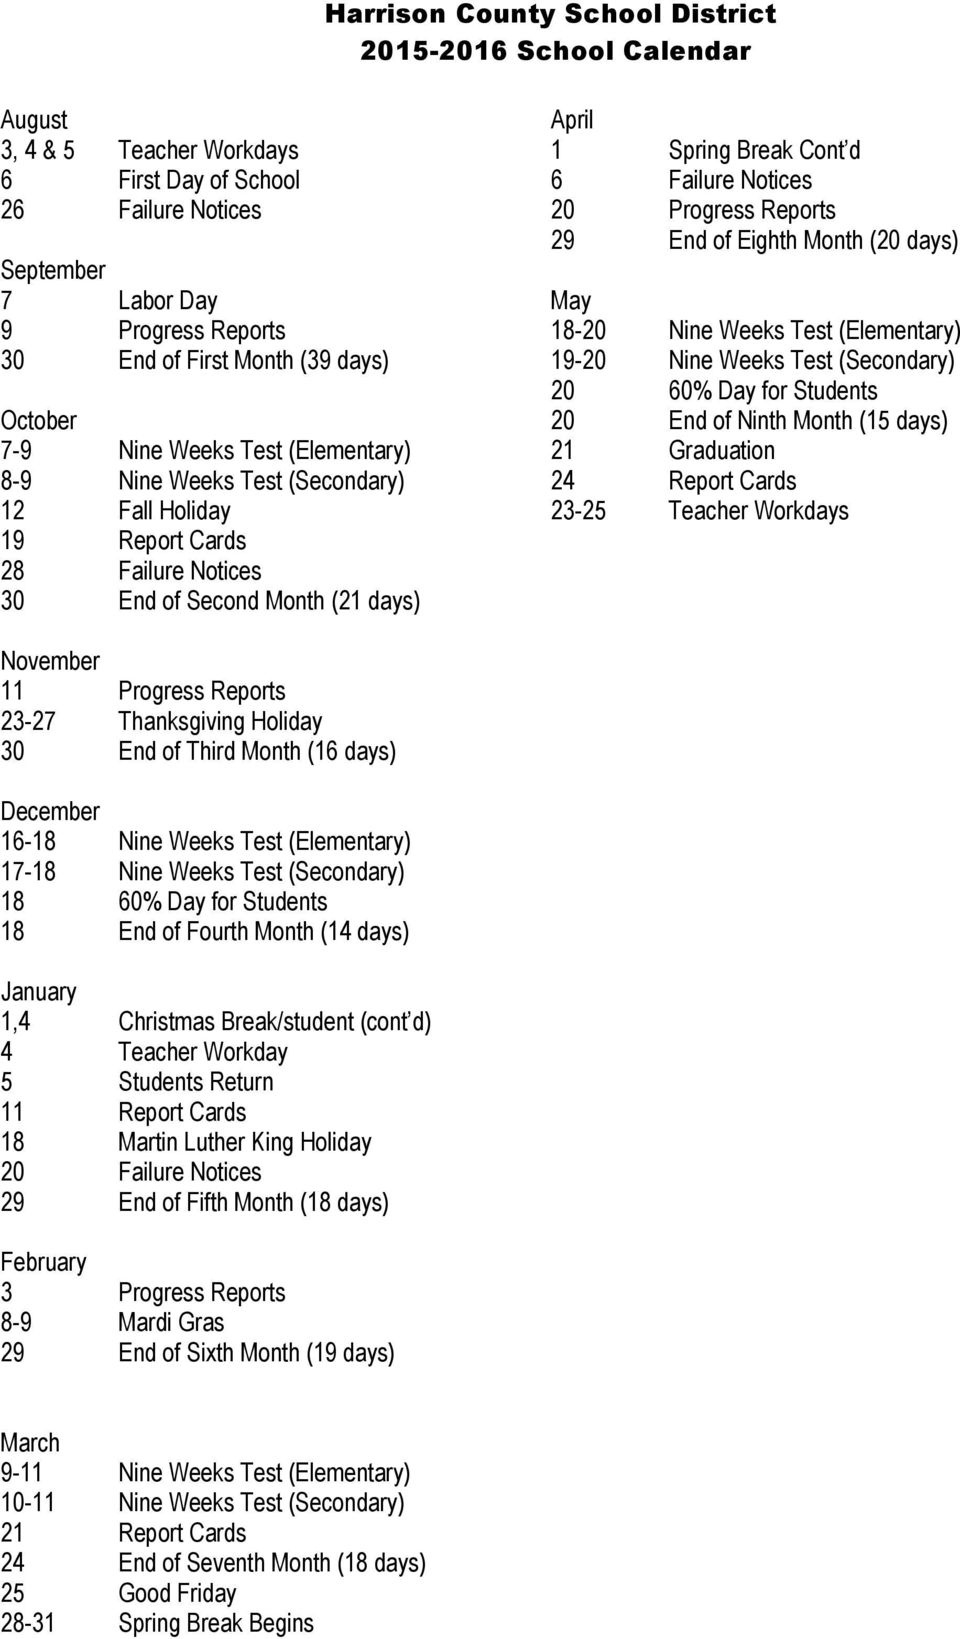 Harrison County School District School Calendar - Pdf_D'iberville Middle School Calendar